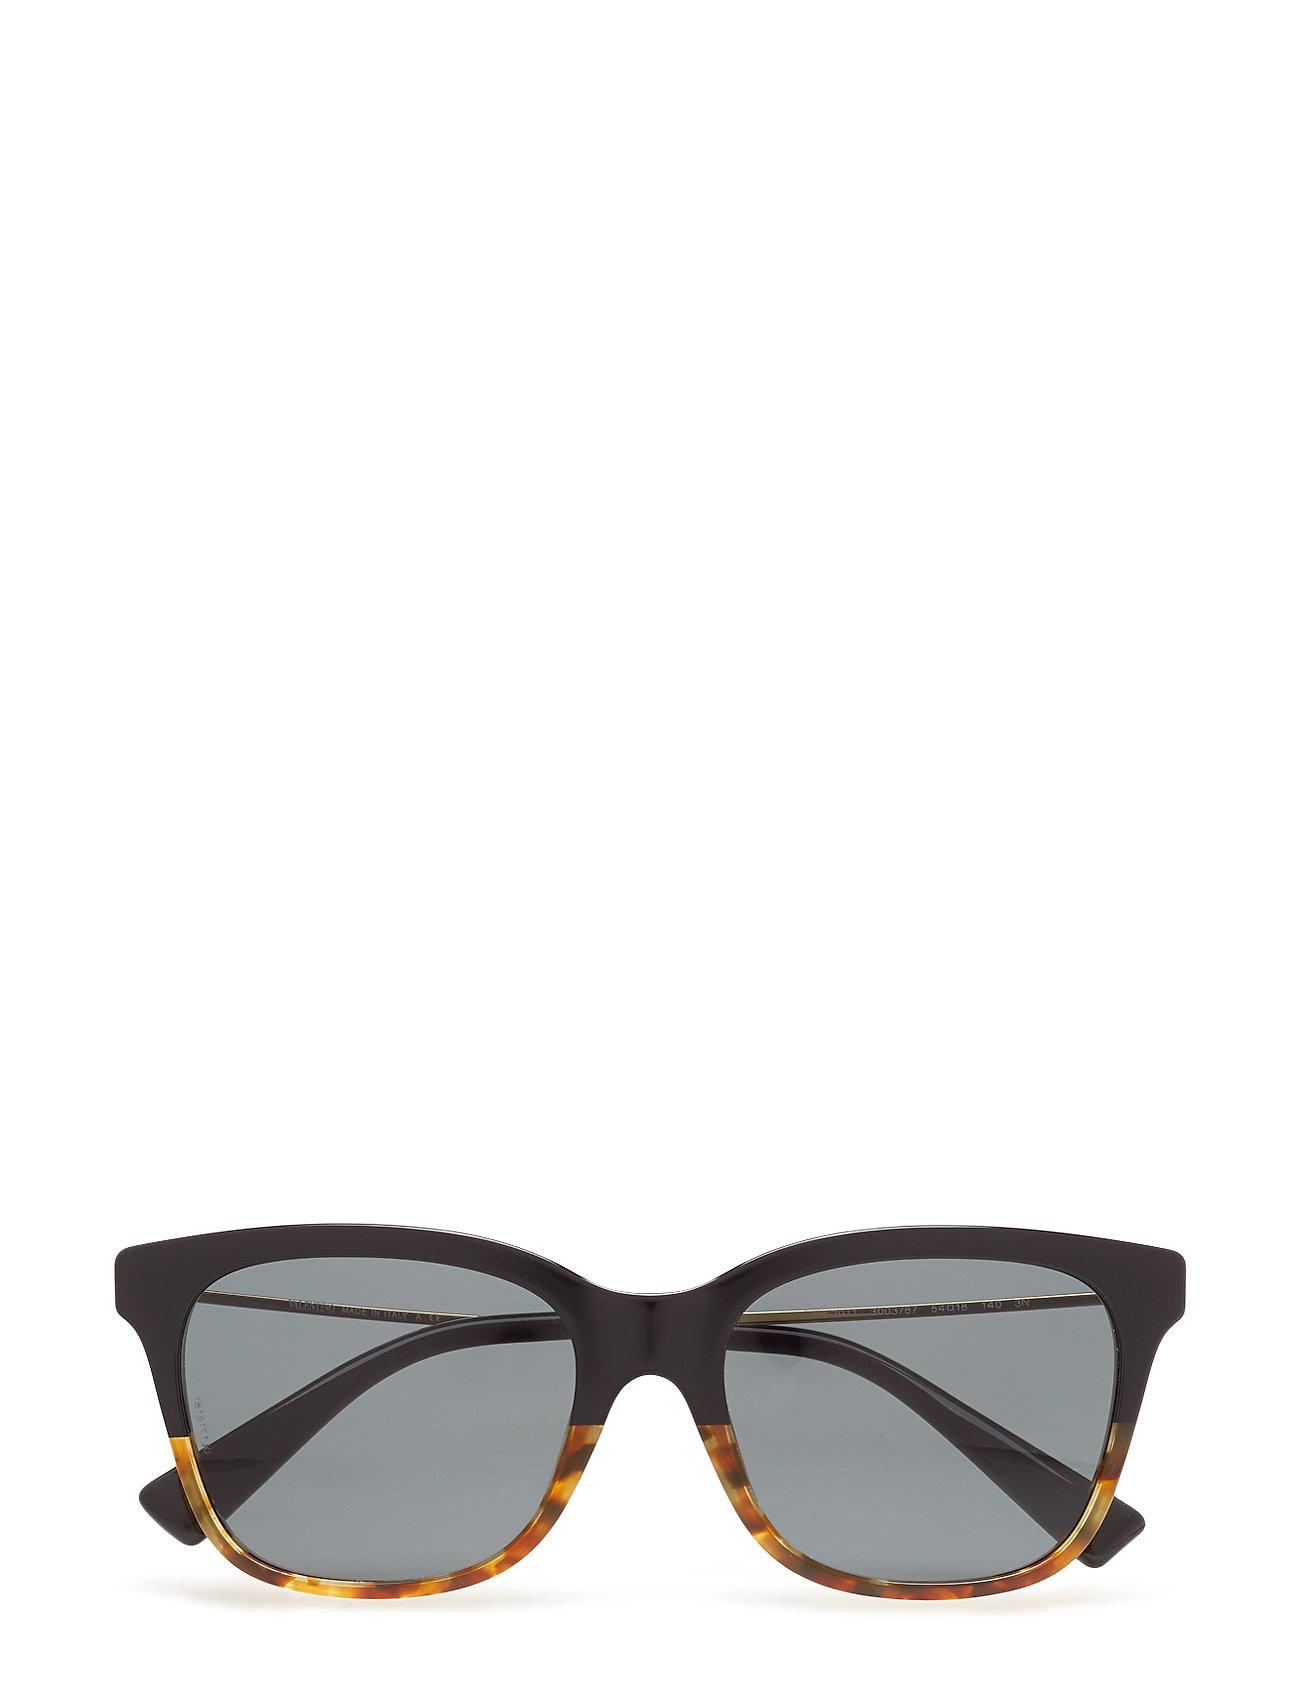 valentino sunglasses – Allure fra boozt.com dk